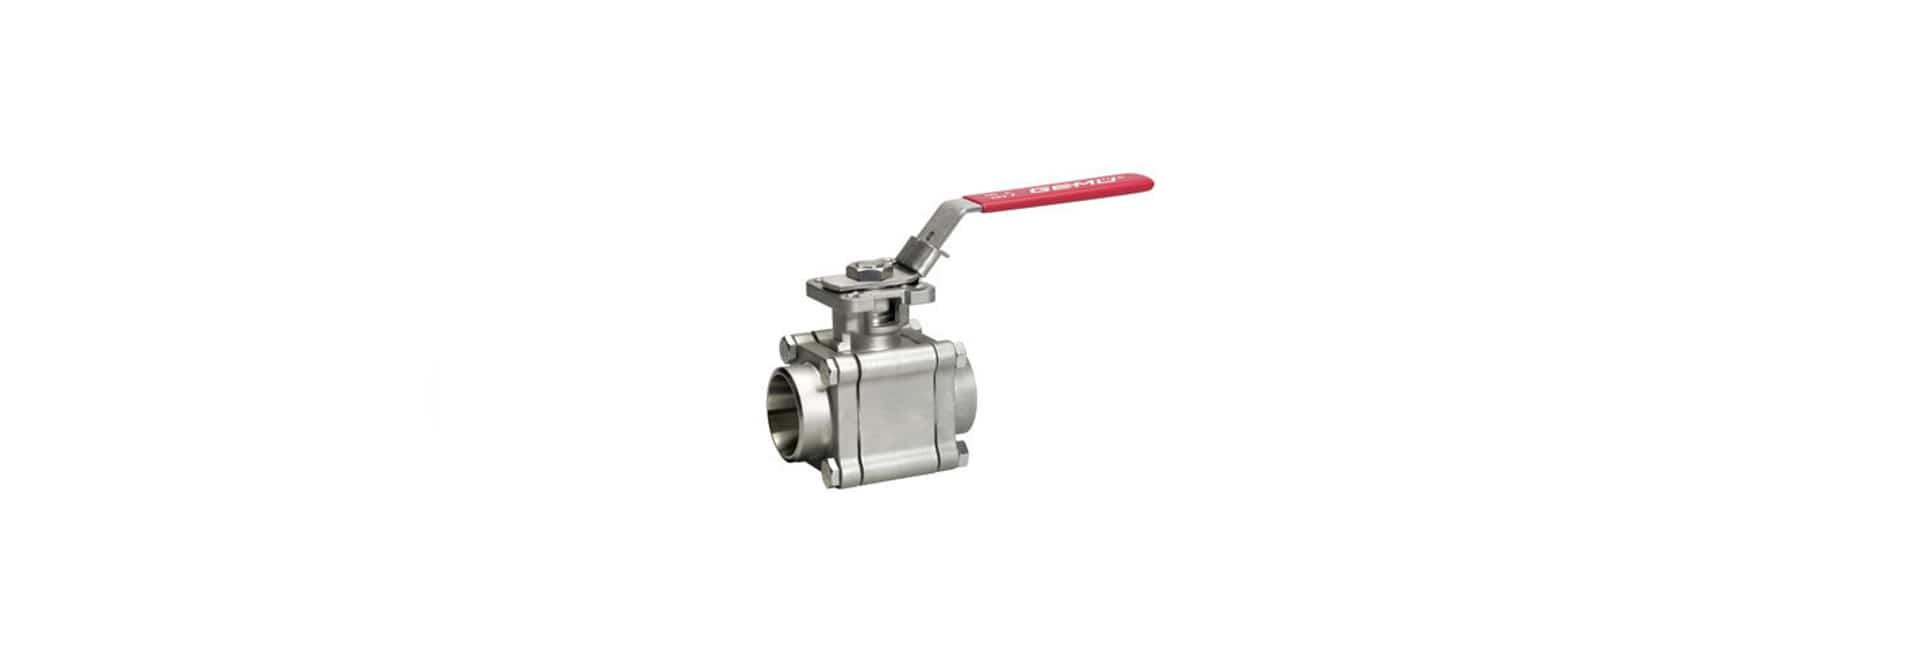 Ball valve GEMÜ 797